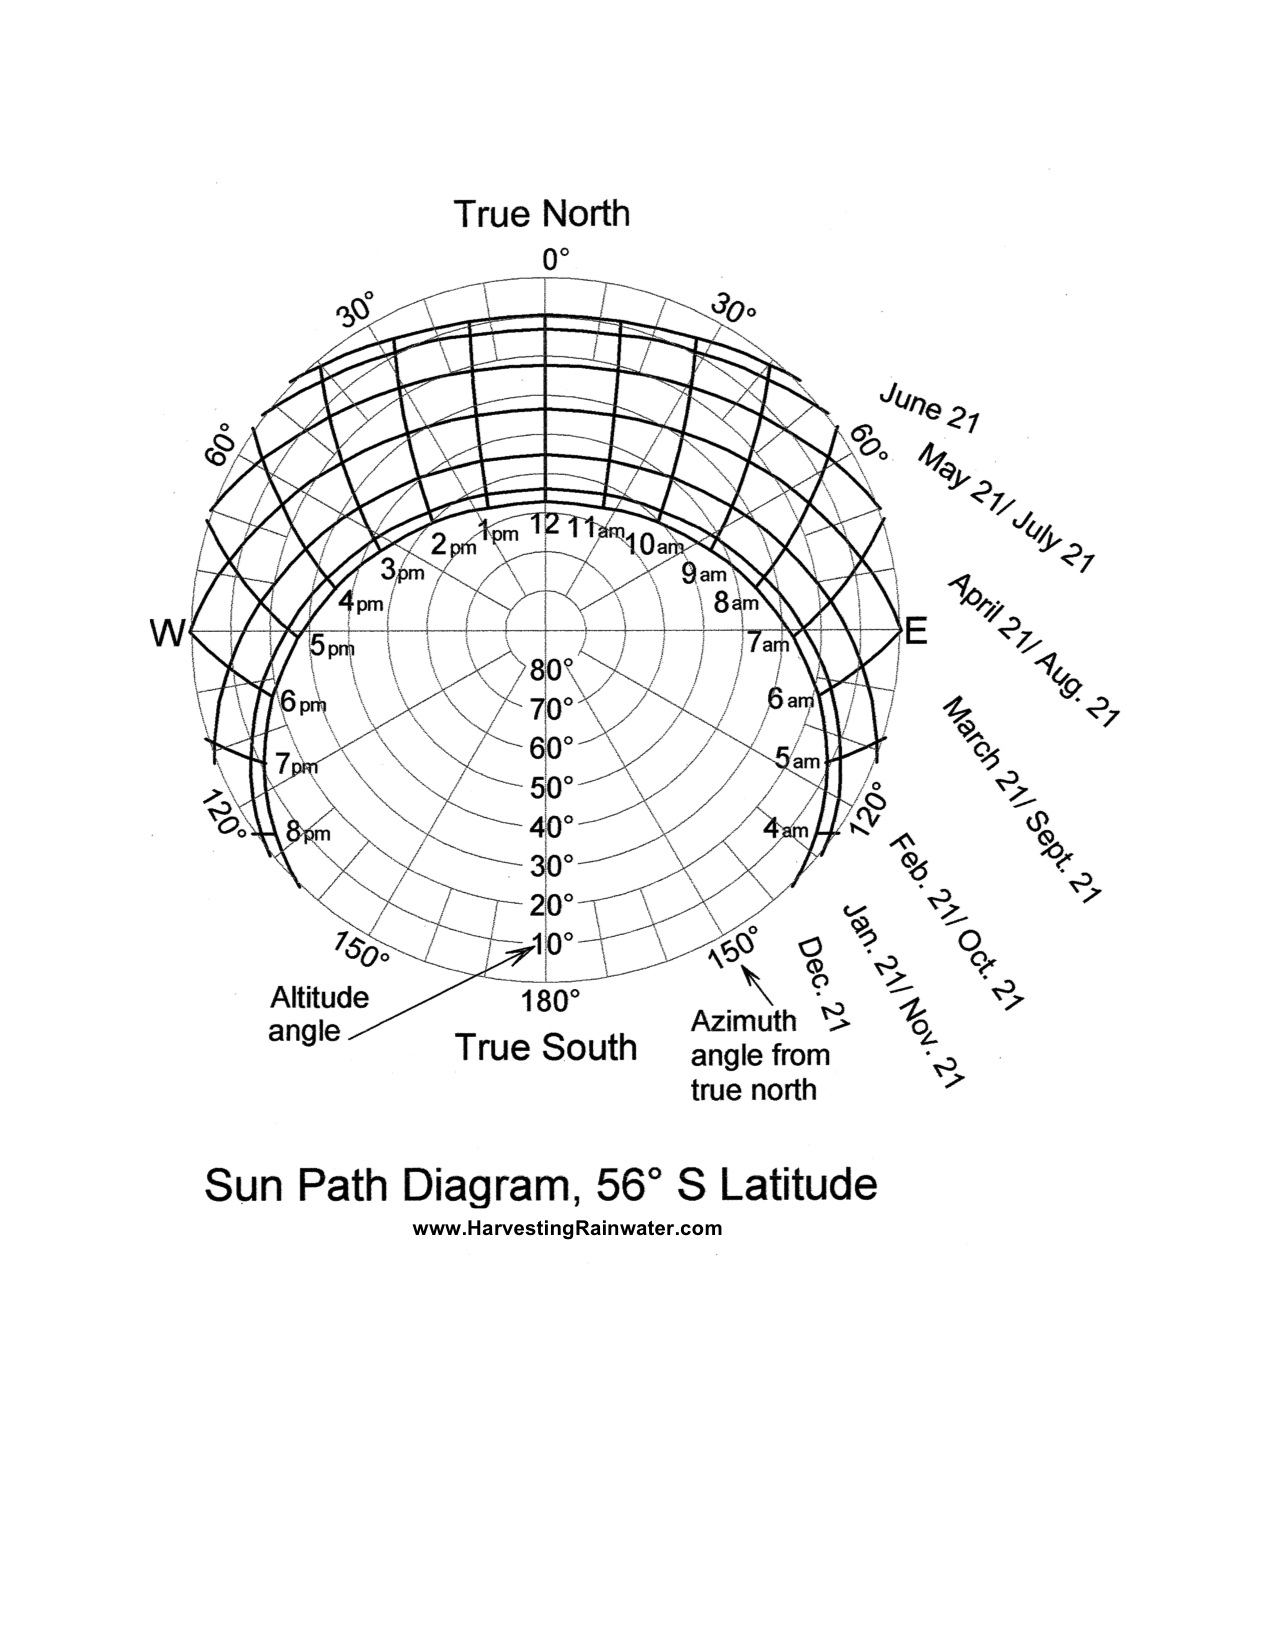 Sun Path Diagram 56o S Latitude